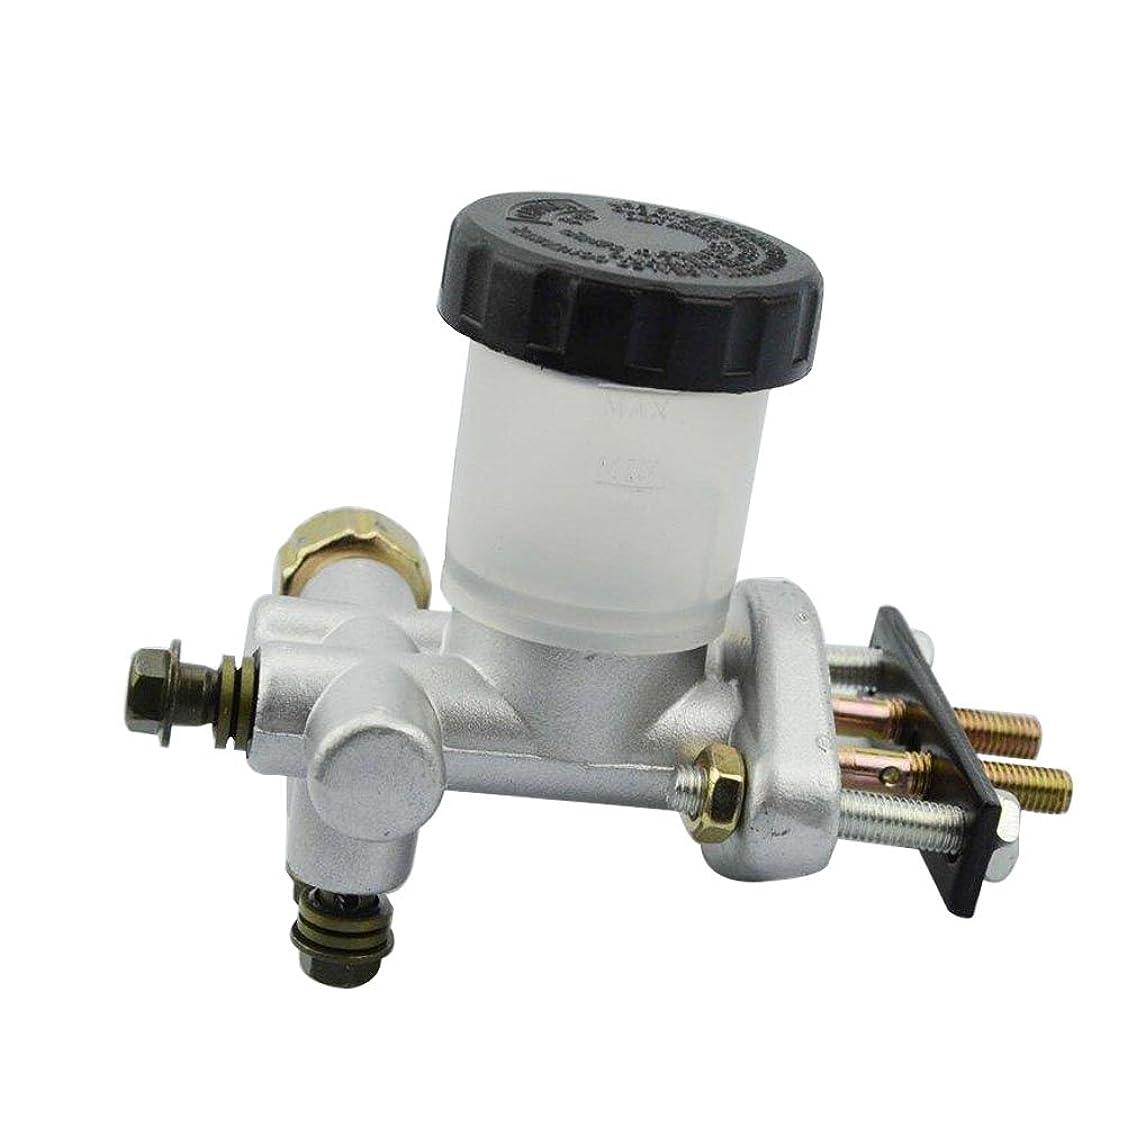 GOOFIT Hydraulic Brake Master Cylinder for 90cc 110cc 125cc 150cc 200cc 250cc Go Kart Buggy Sunl BMS Kandi Roketa Kazuma Kinroad